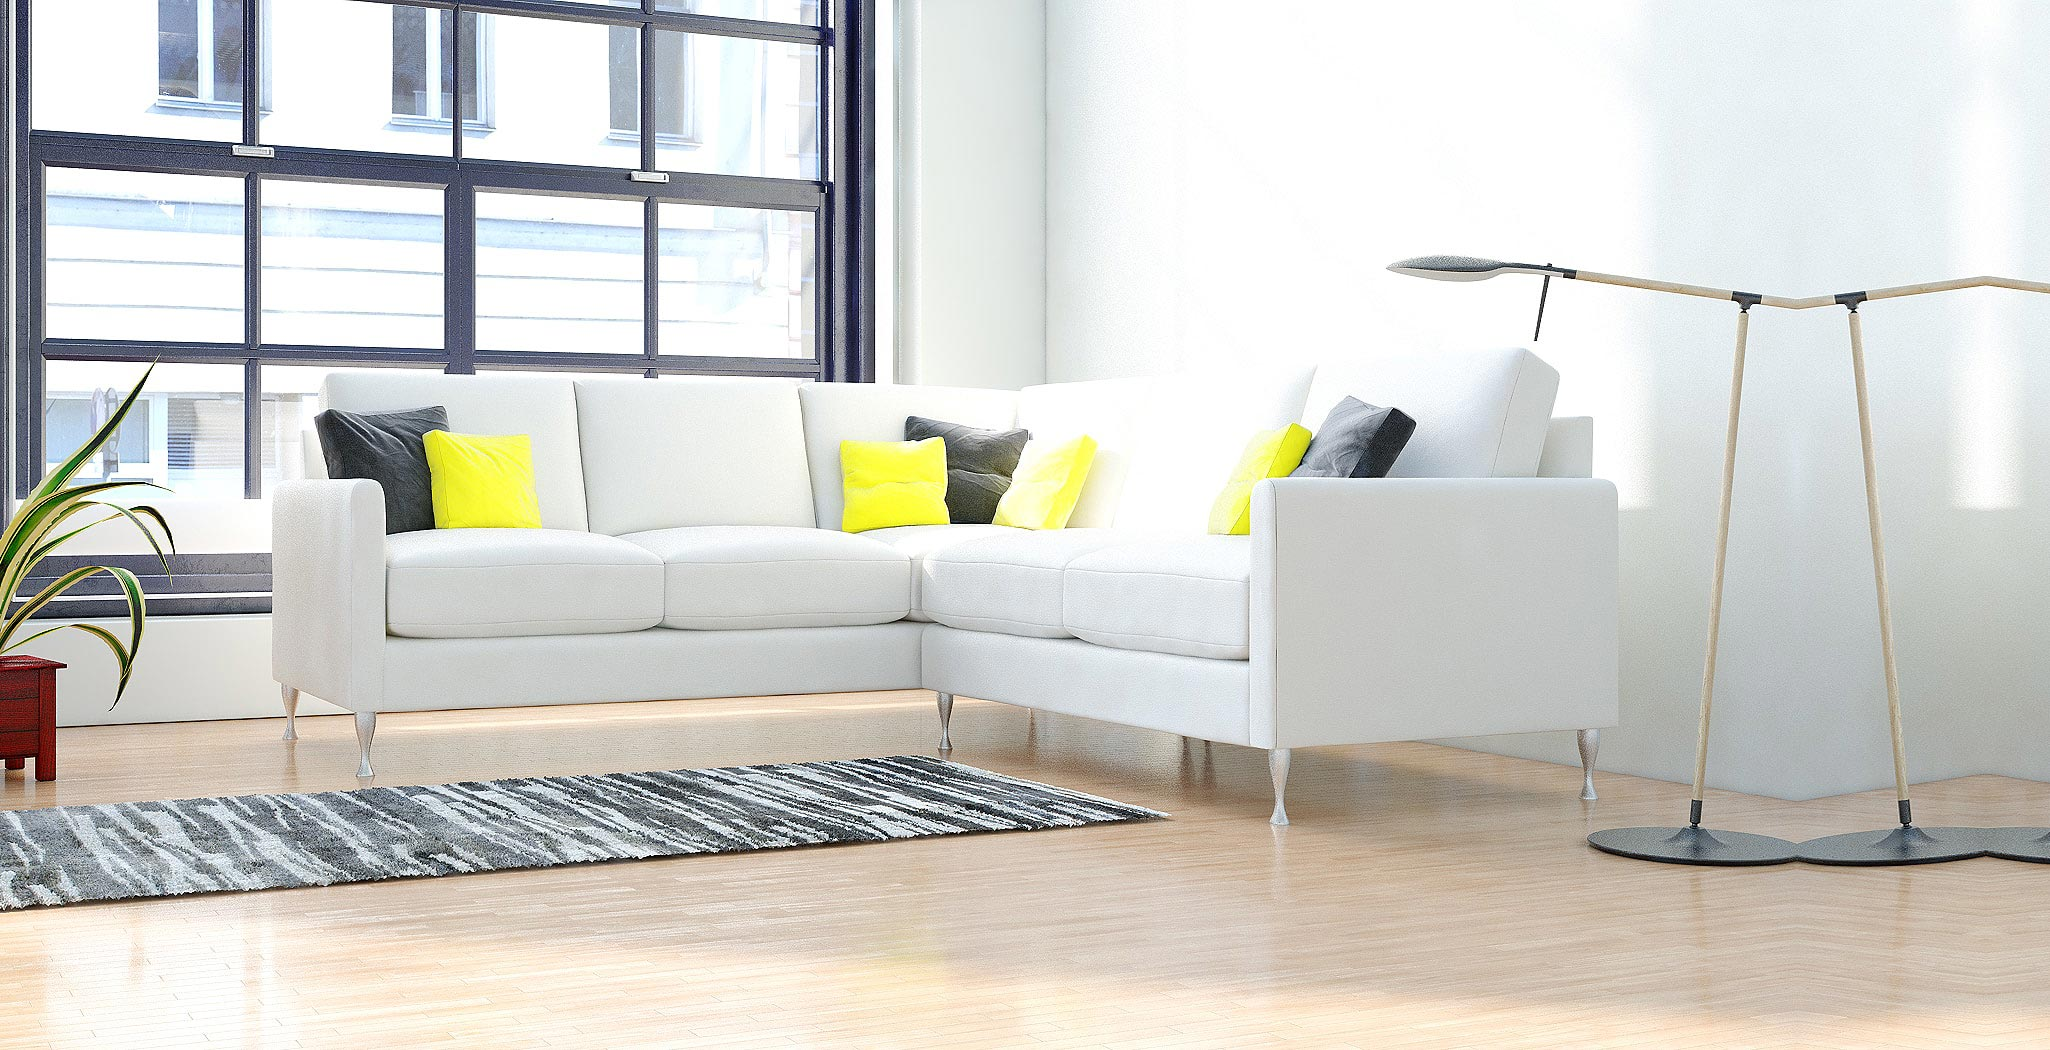 eureka sectional furniture gallery 2